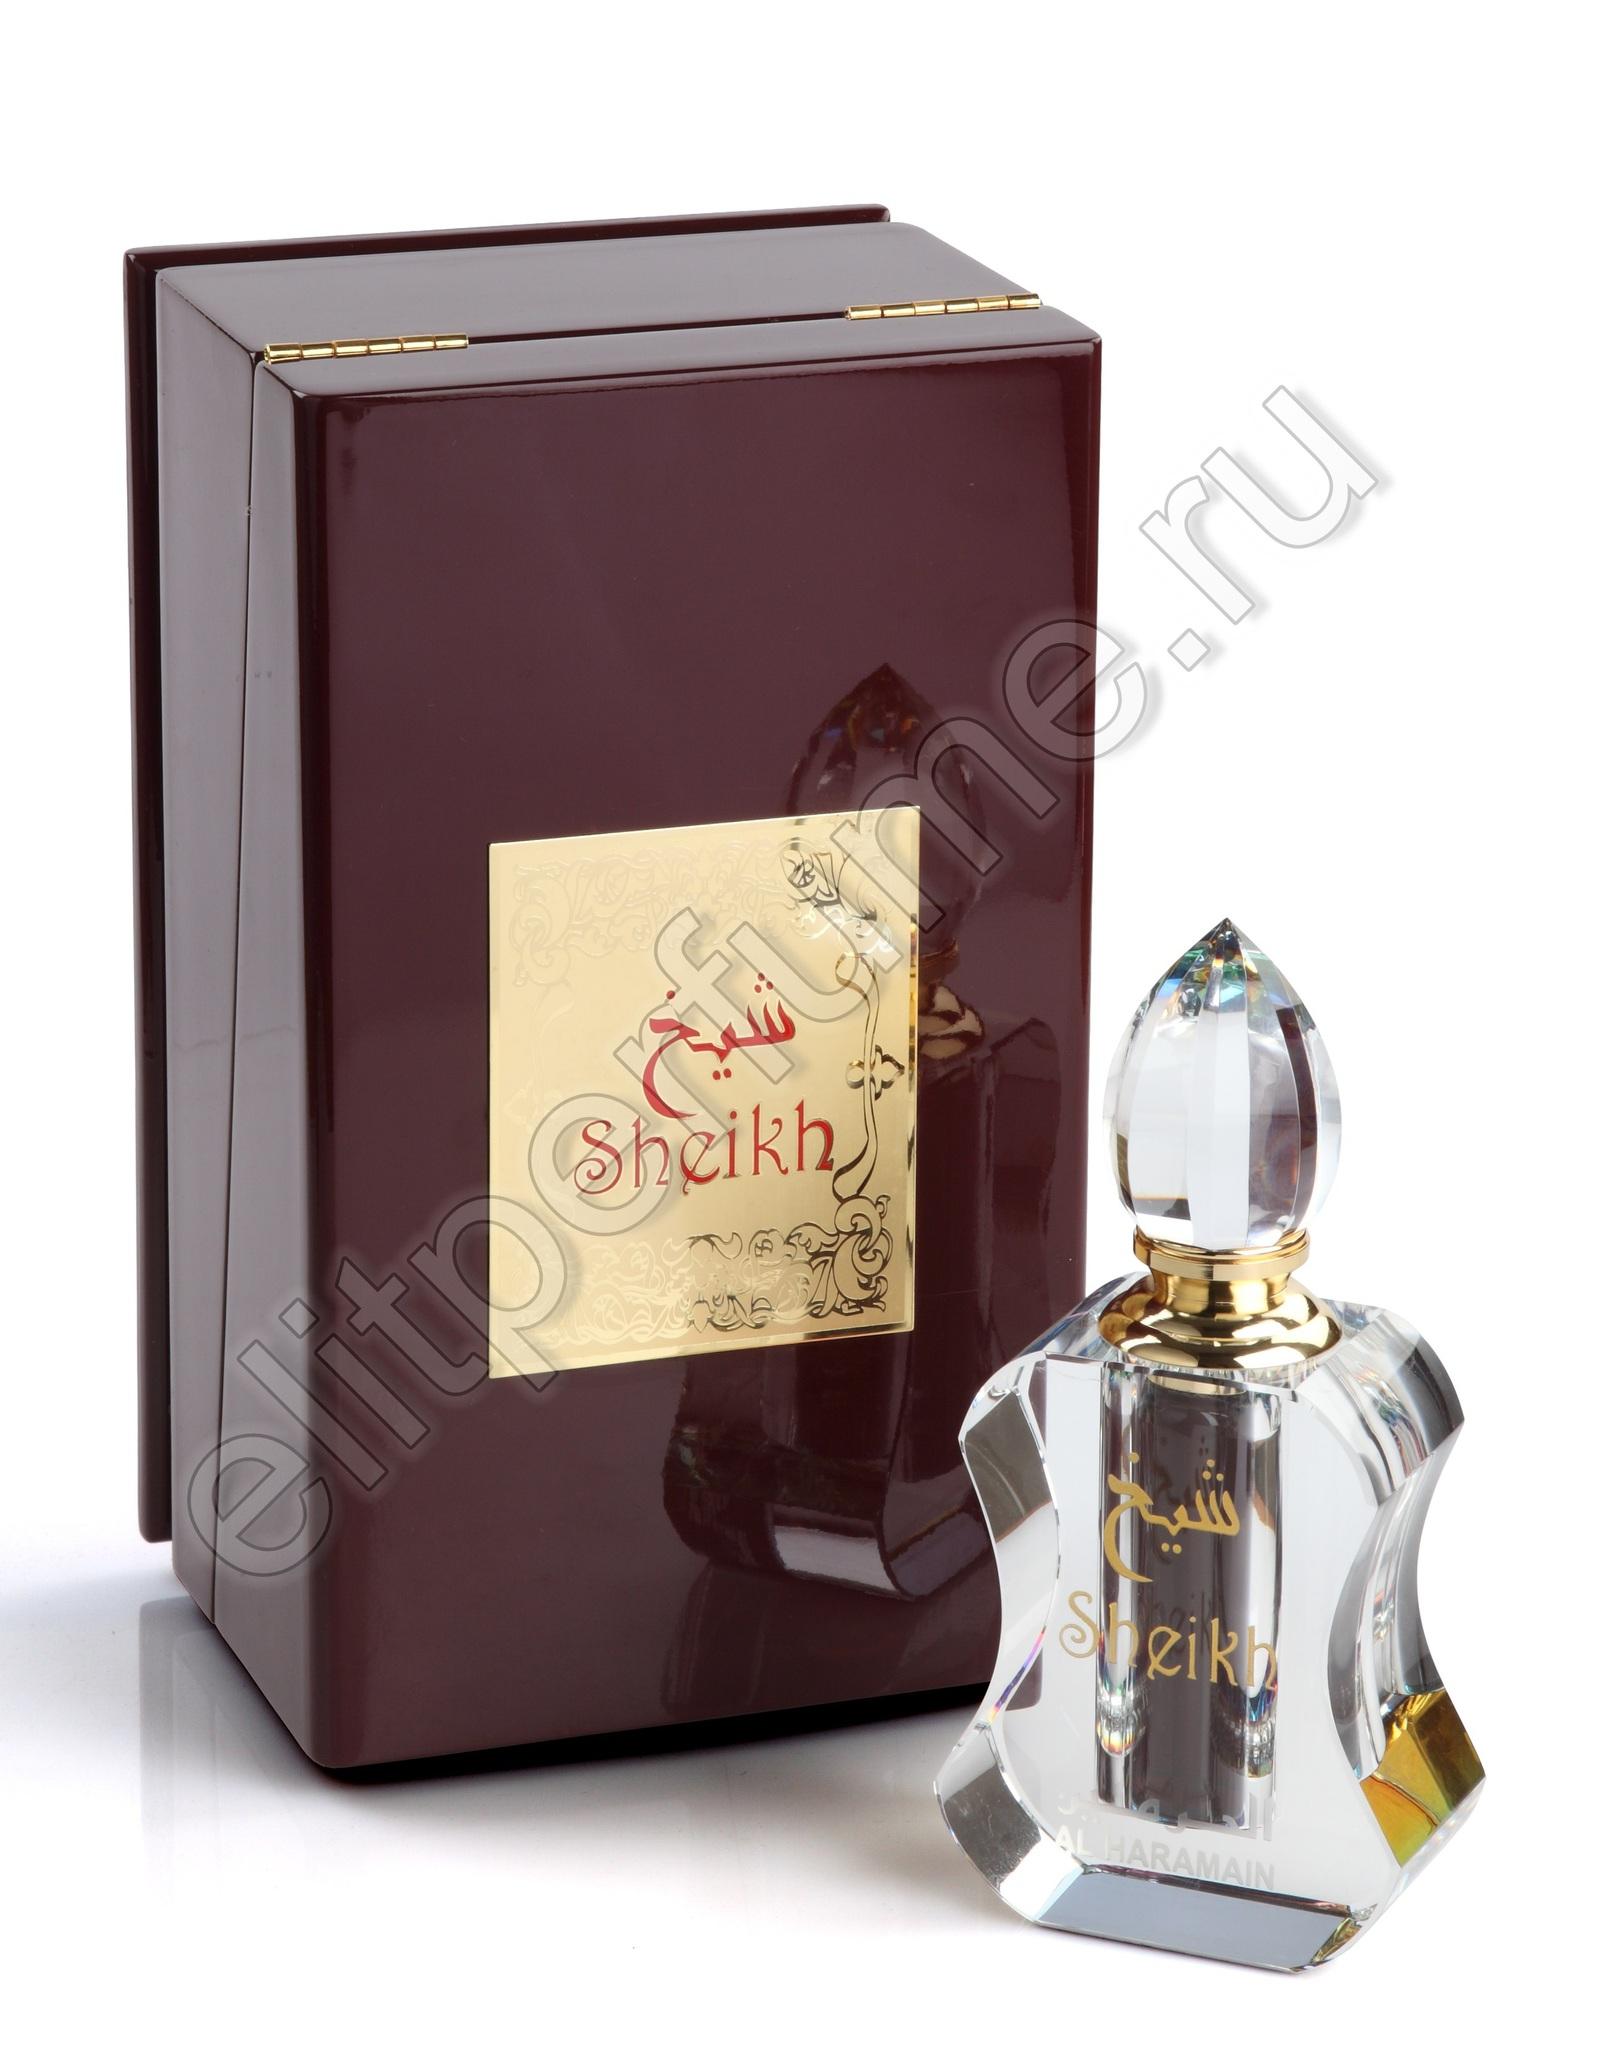 Шейх Sheikh 60 мл арабские мужские масляные духи от Аль Харамайн Al Haramain Perfumes